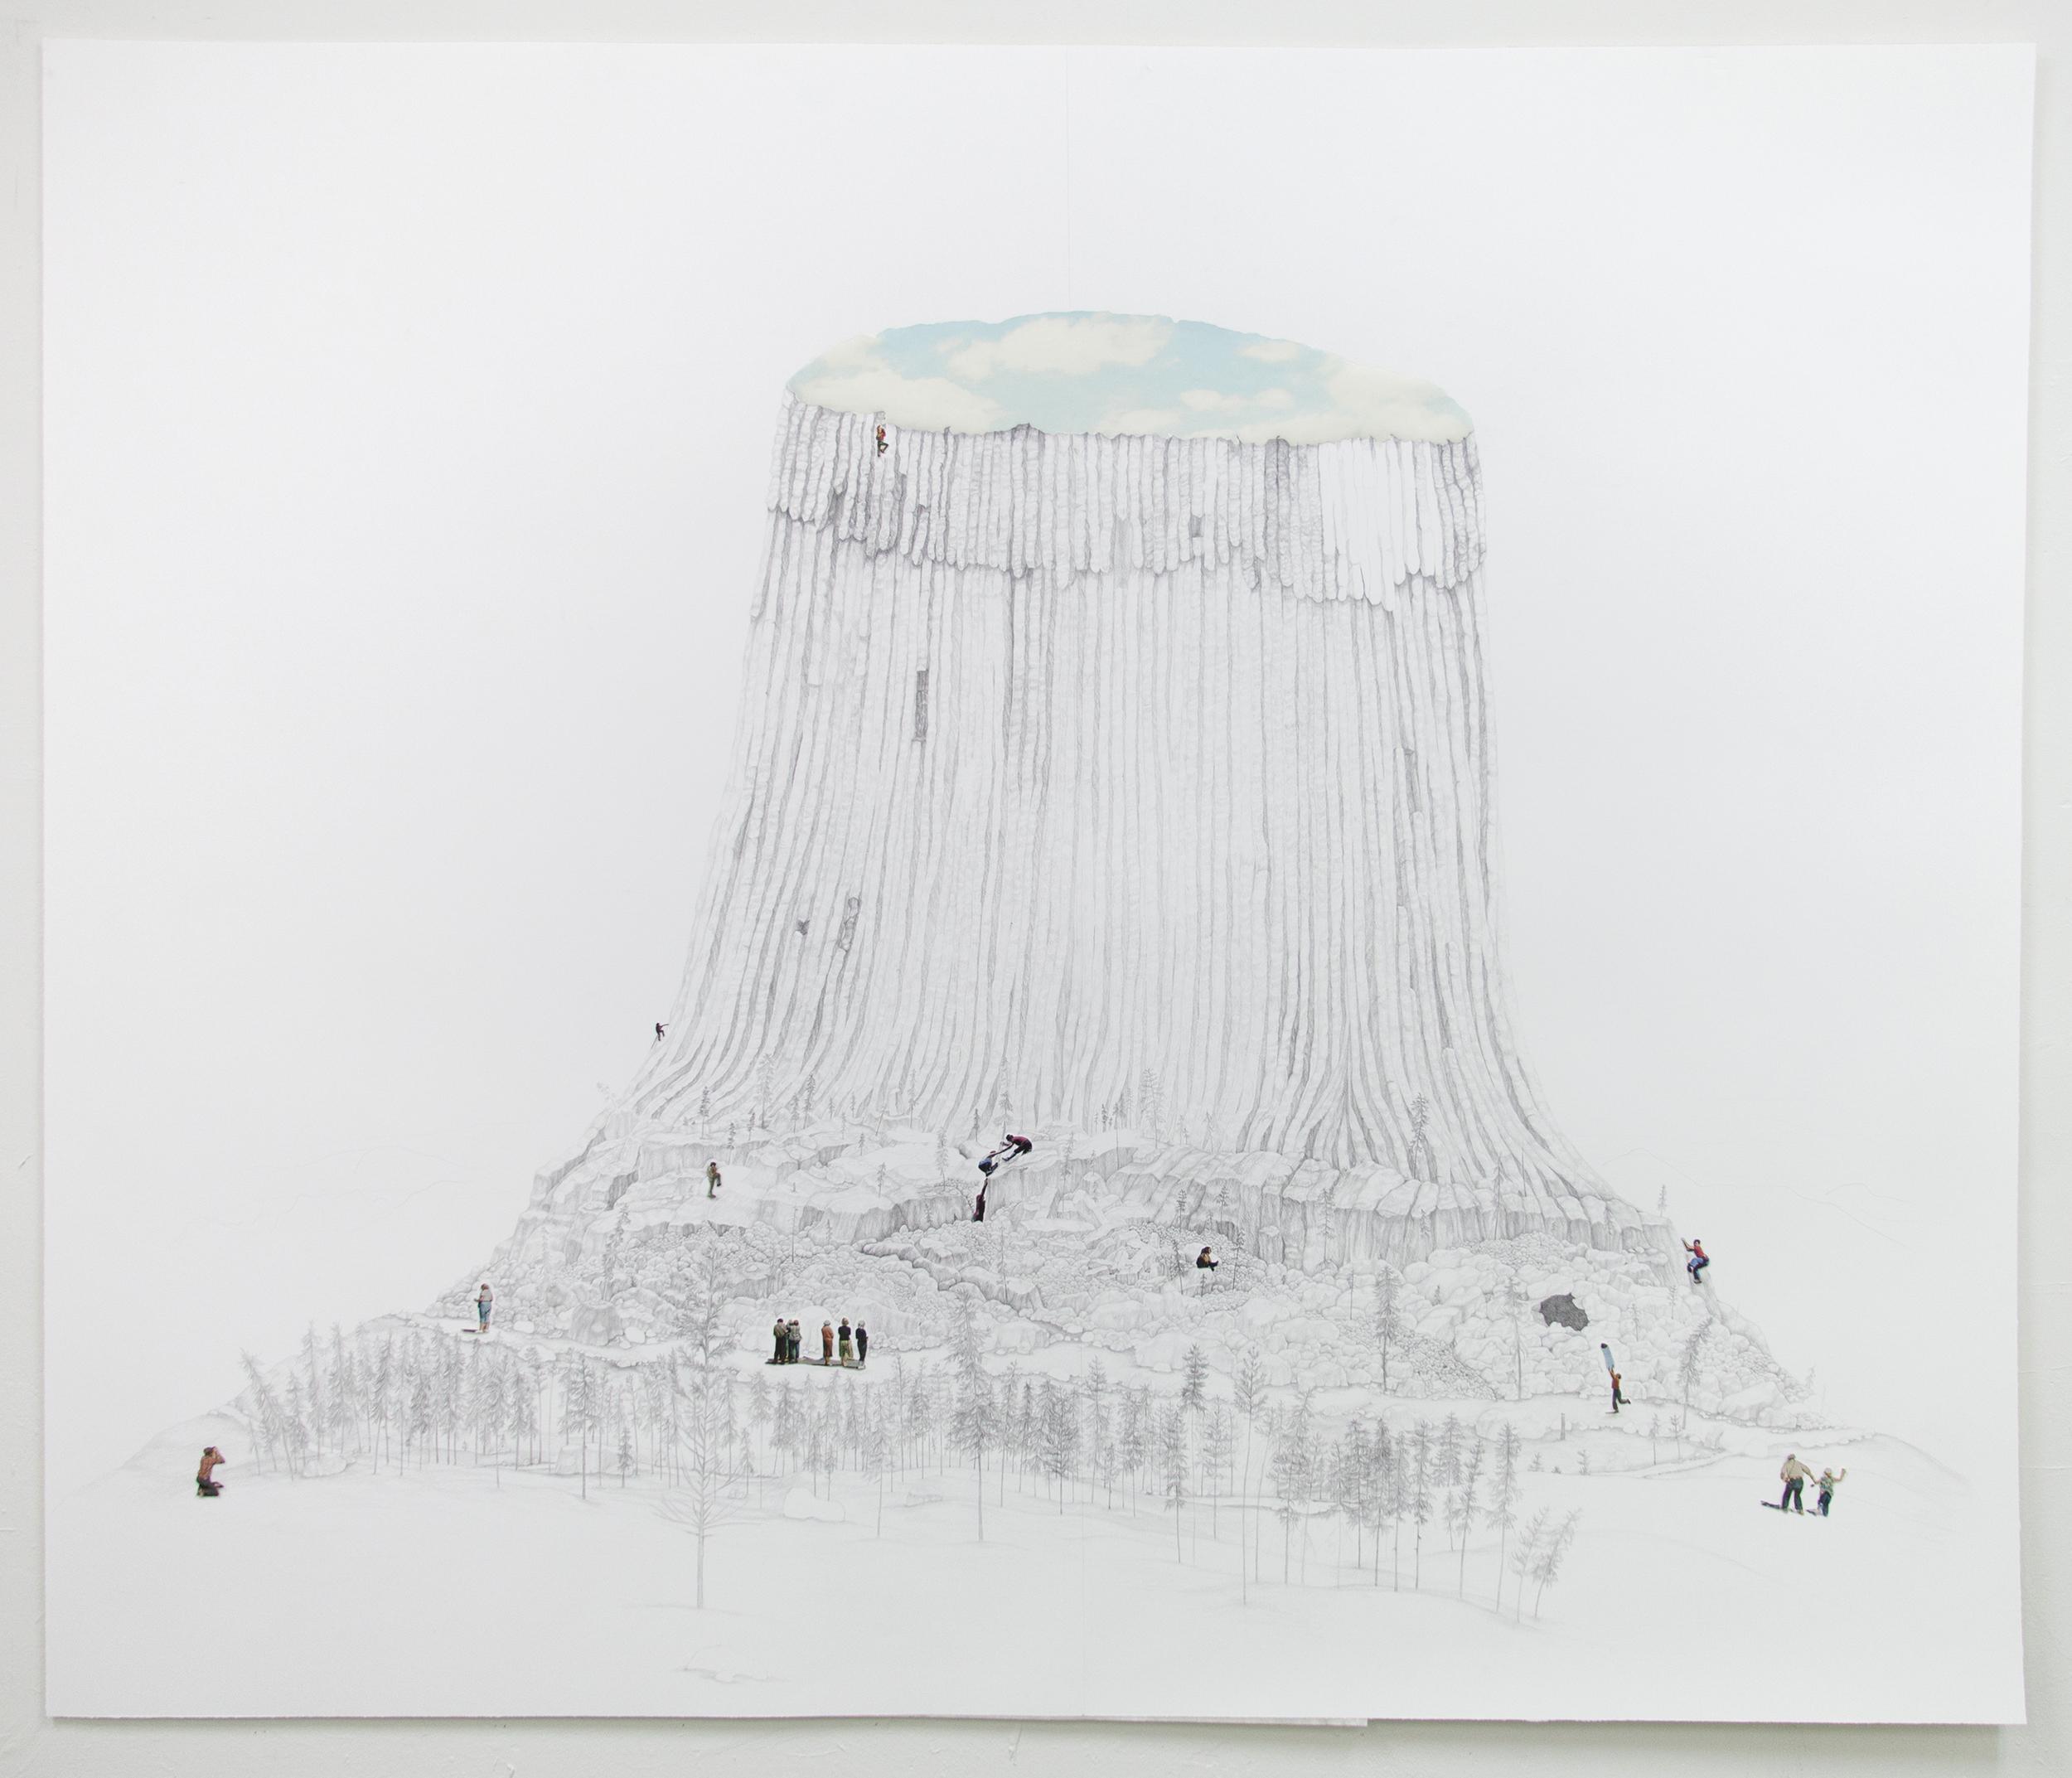 Bad God's Tower